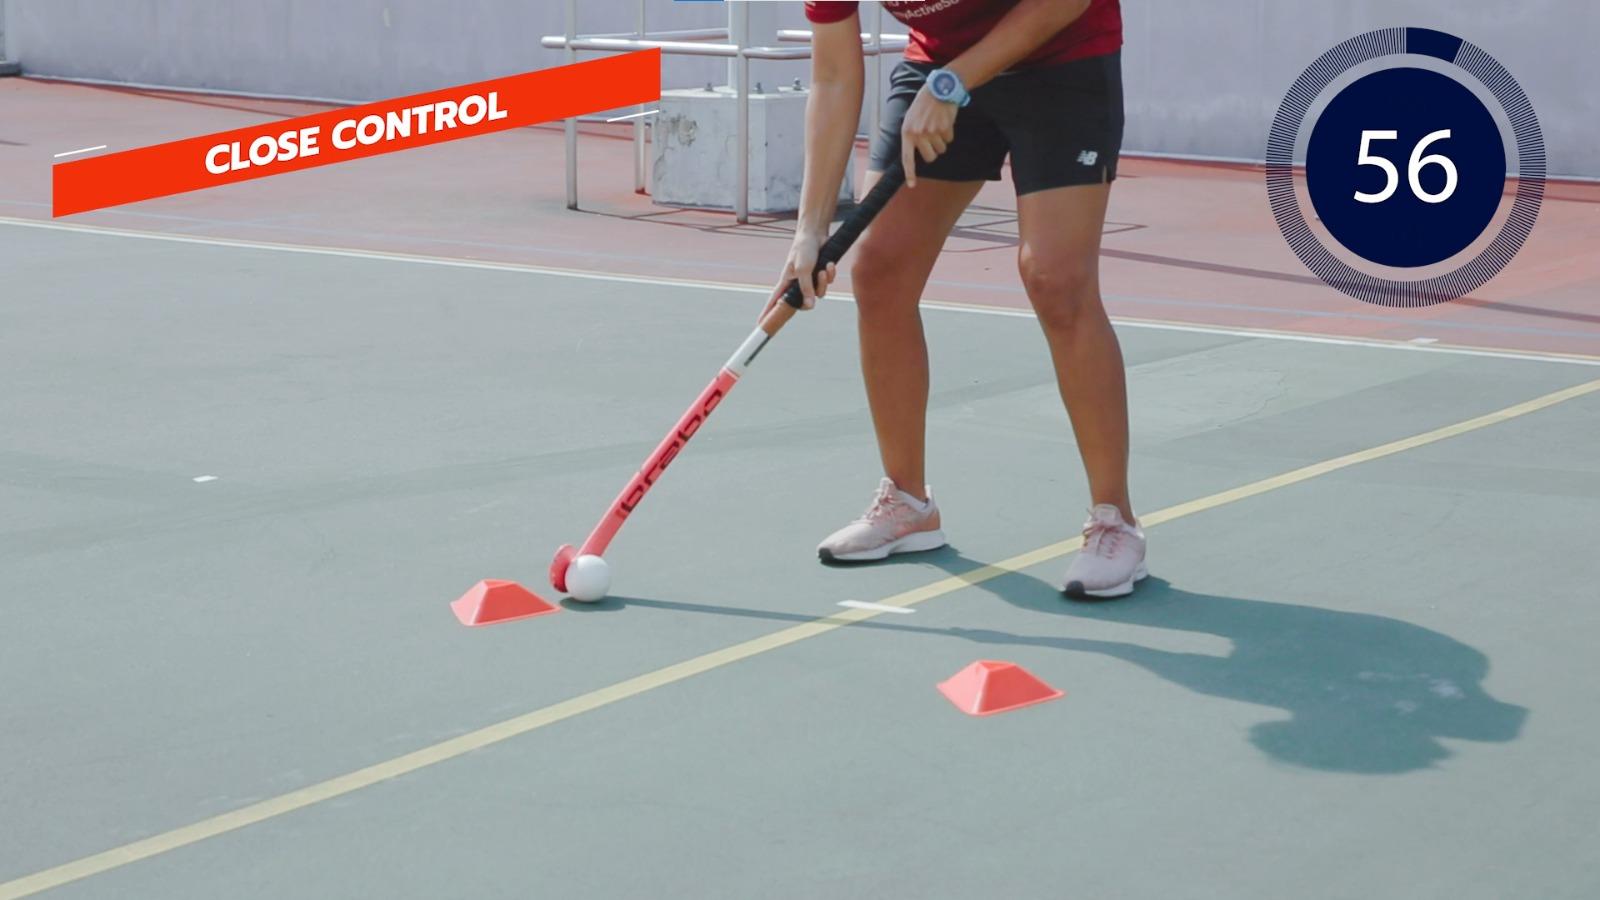 hockey close control